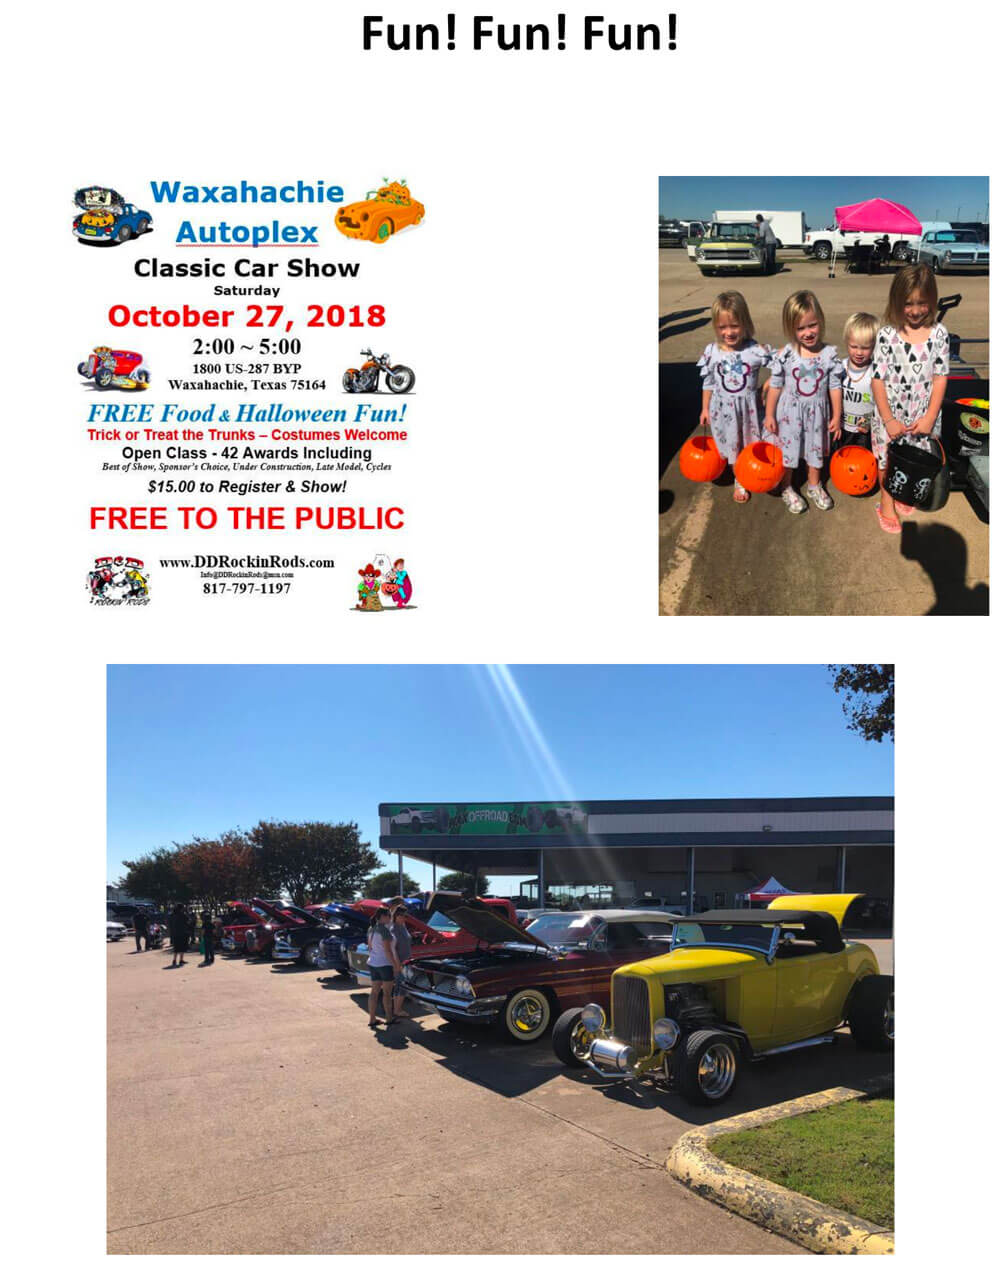 Waxahachie Autoplex Classic Car Show